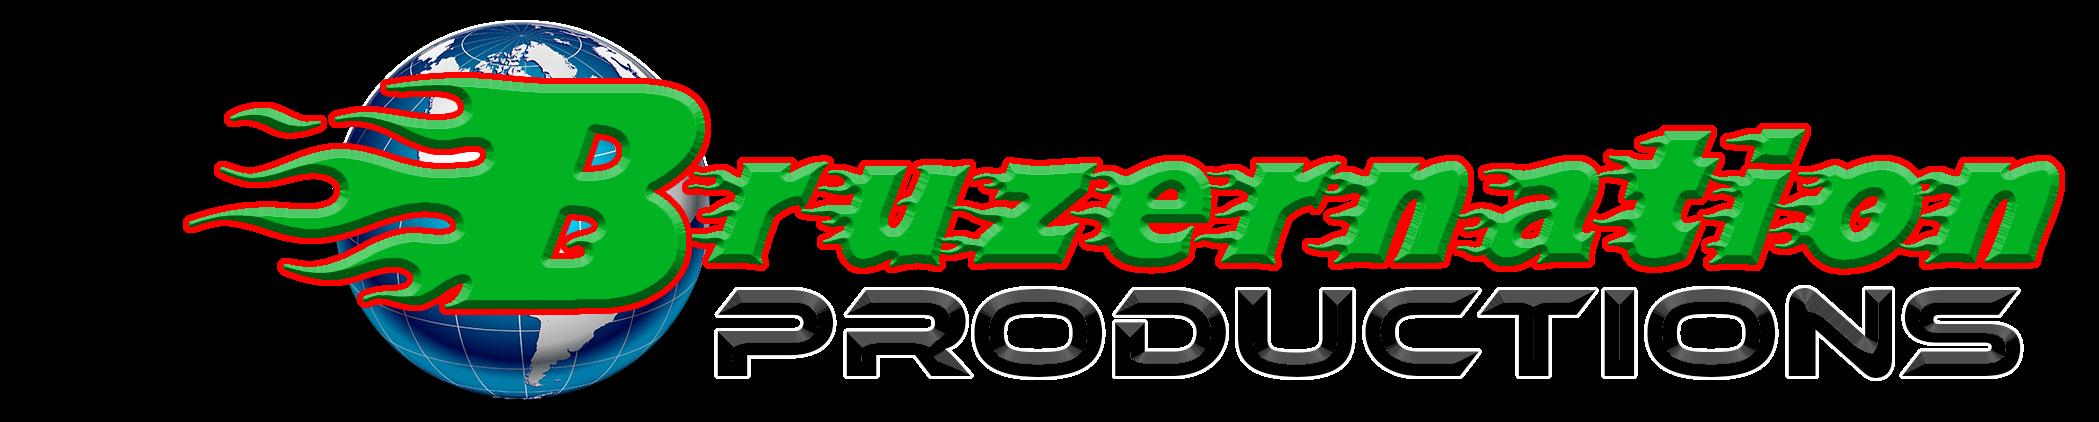 Bruzernation Productions